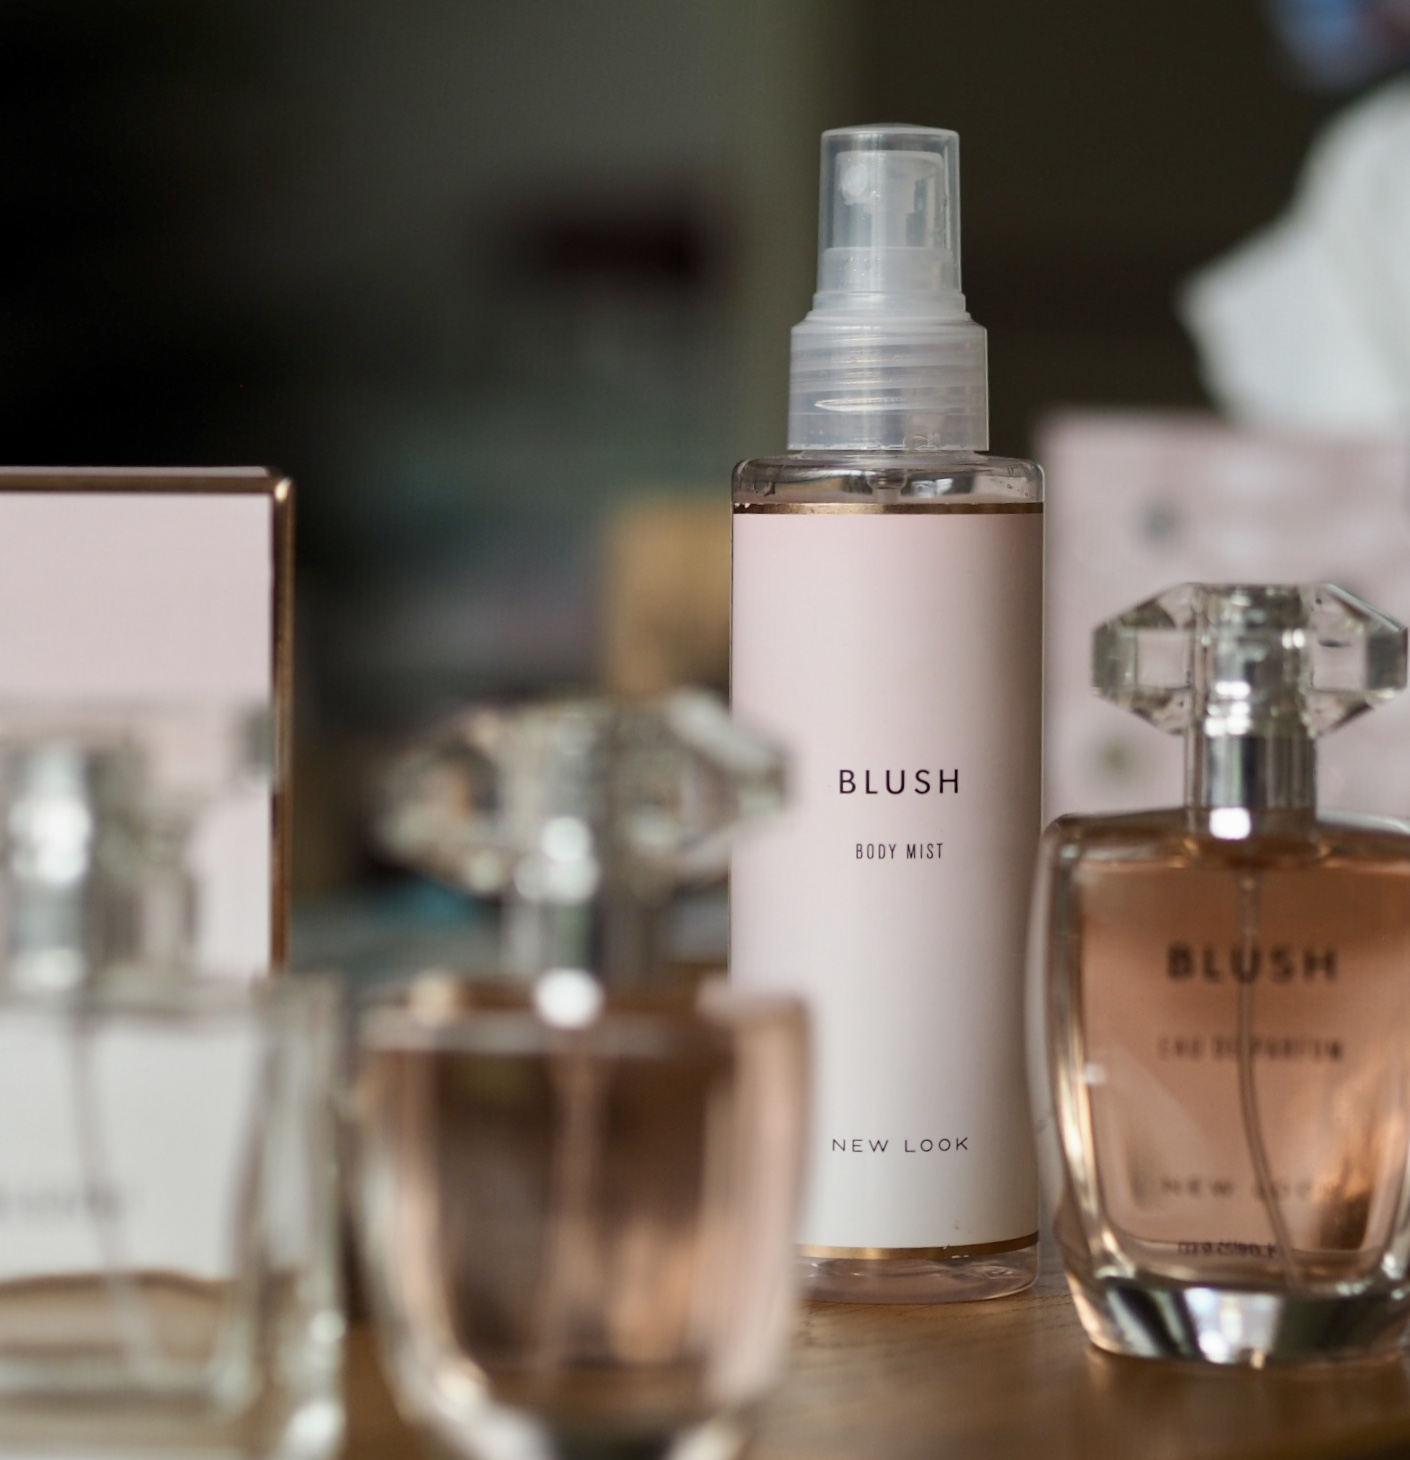 Blush Eau de Parfum by New Look. Chanel coco Mademoiselle dupe